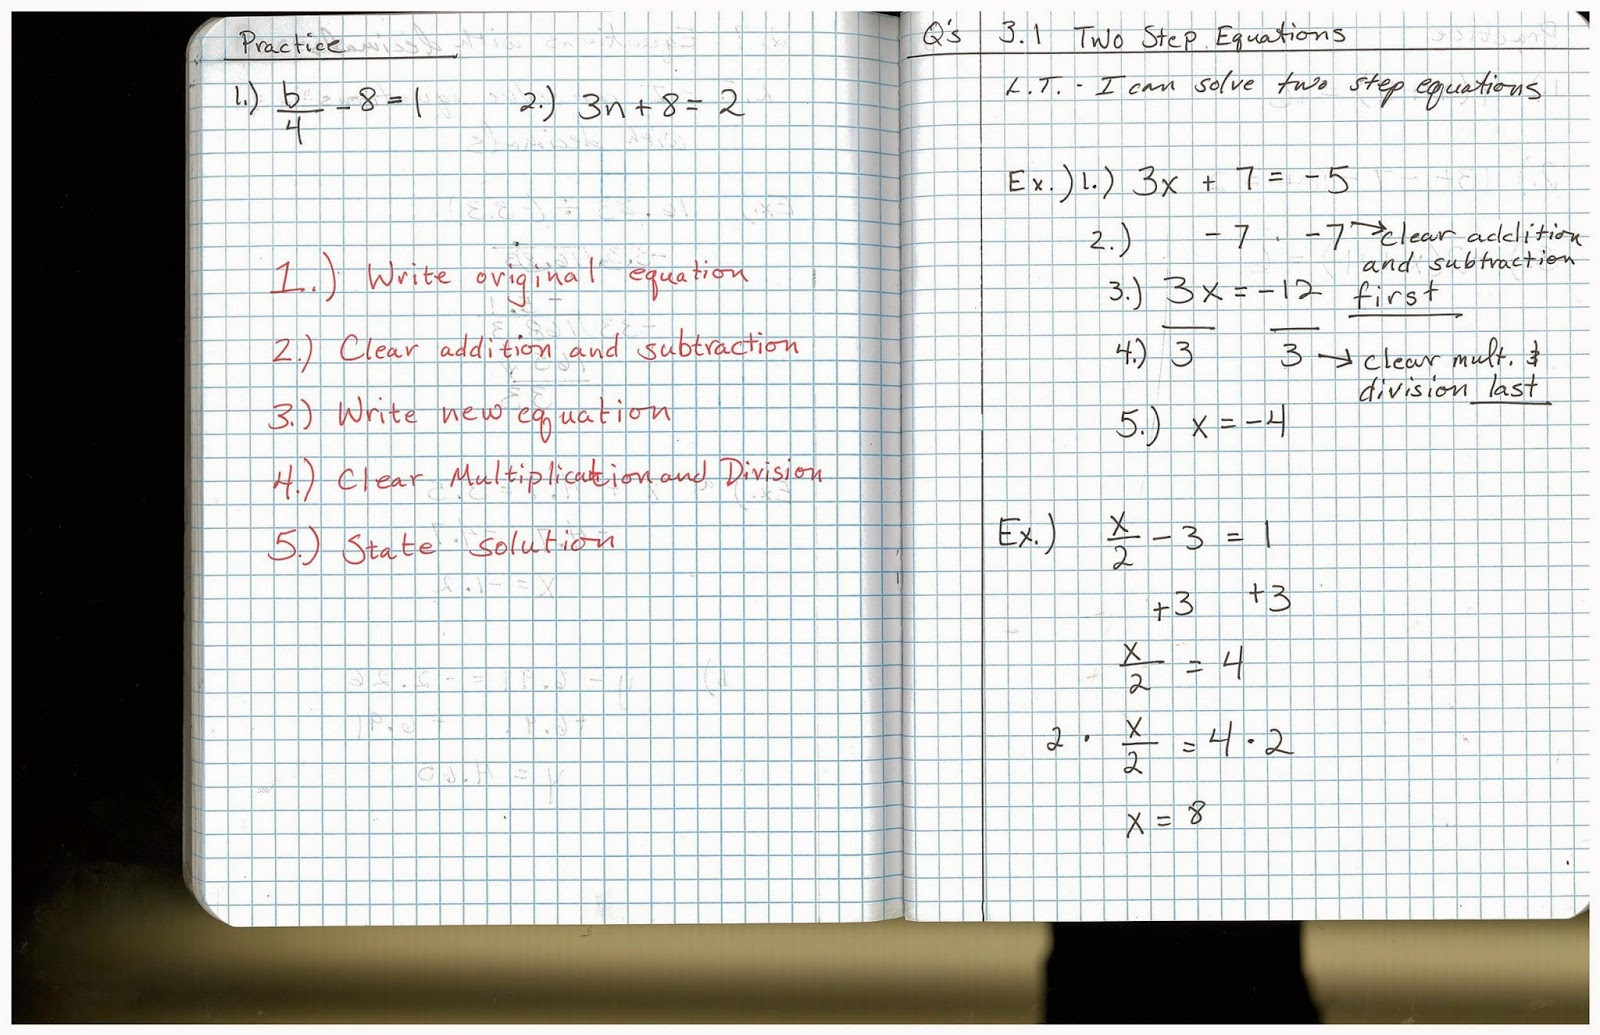 medium resolution of Heidemann 8th Grade Math: 5th Period Pre Algebra 10/20